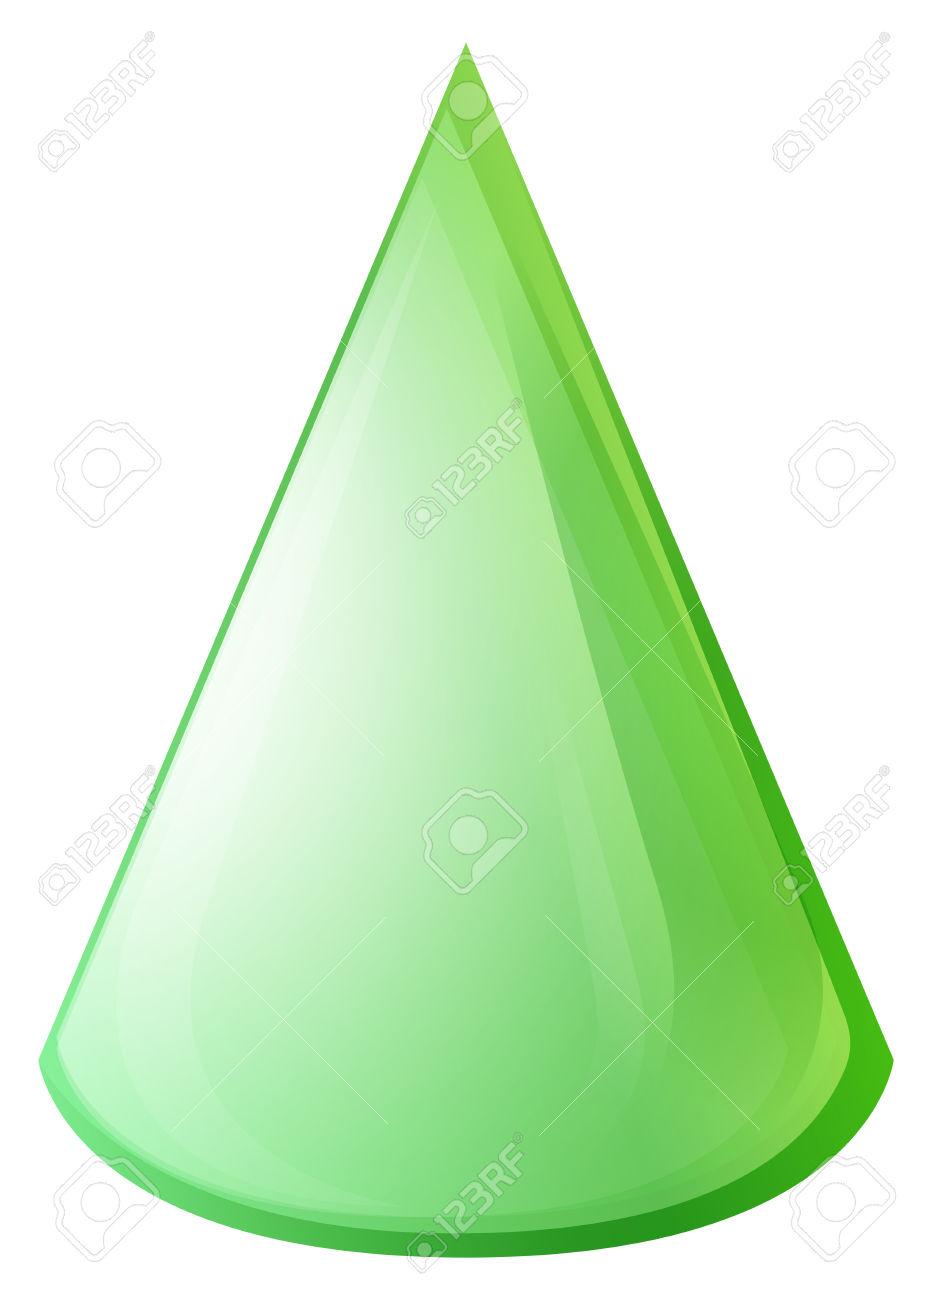 Clipart cone shape.